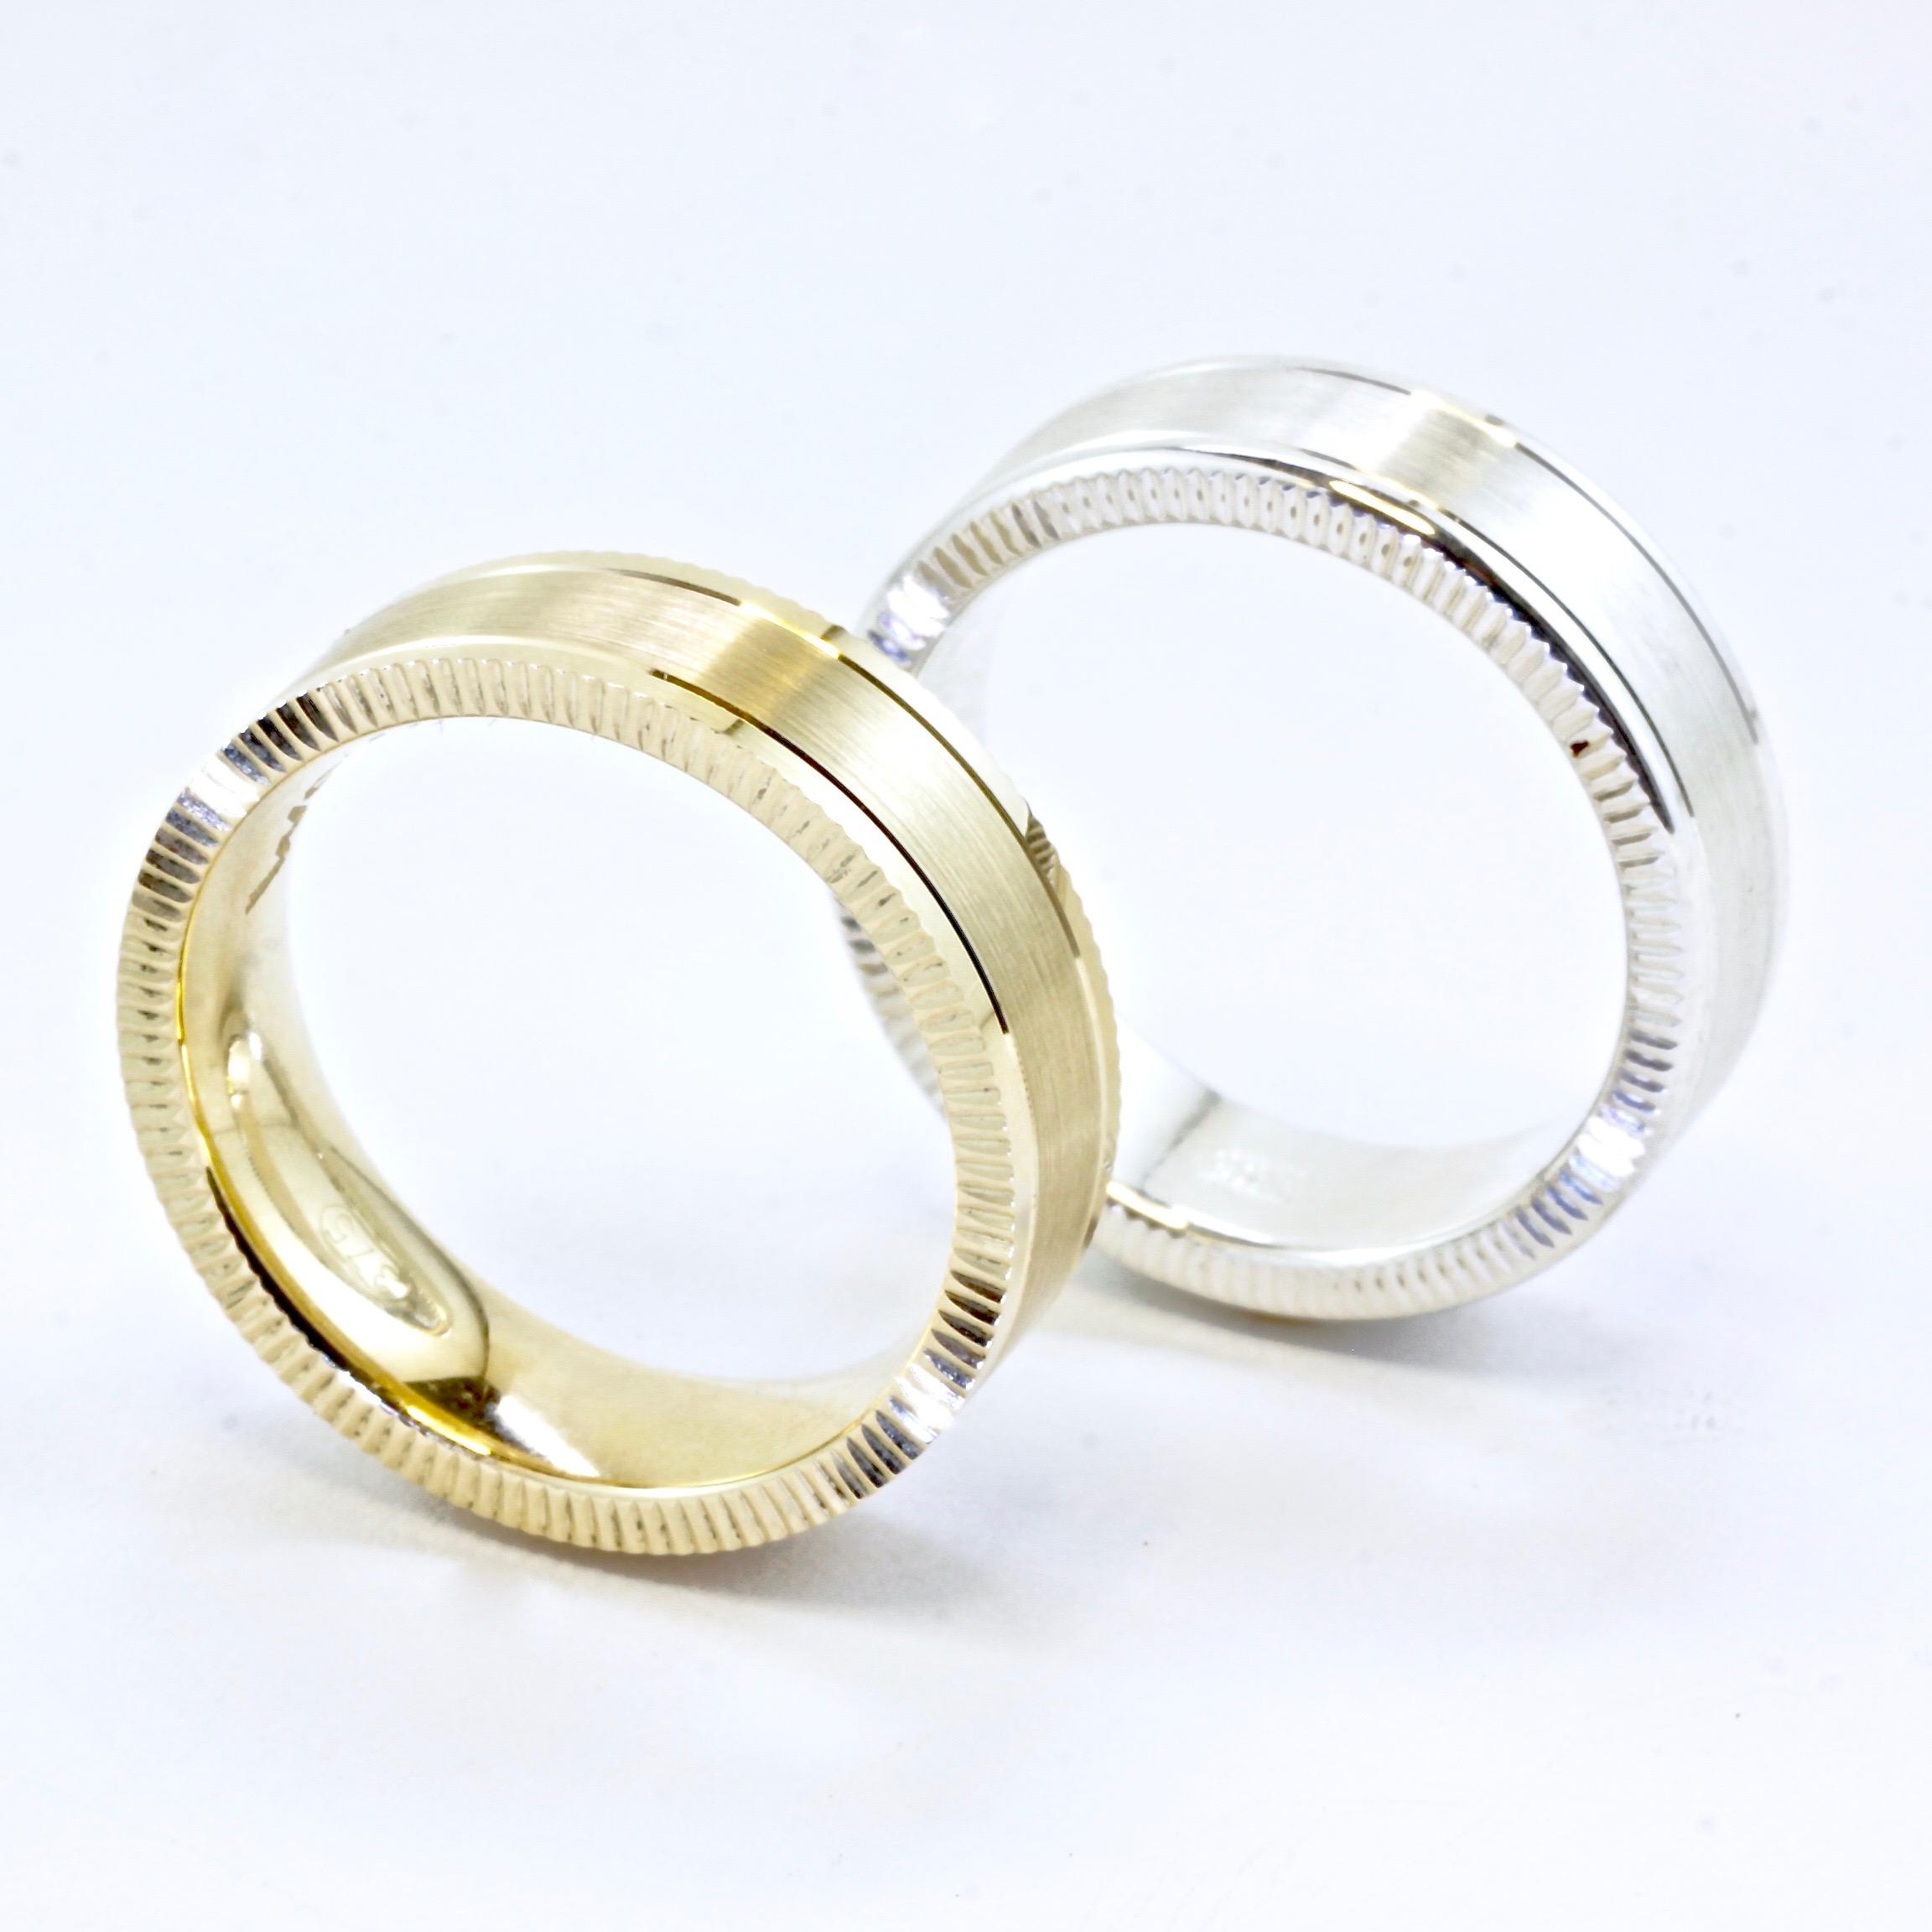 Knurled edge mens wedding ring